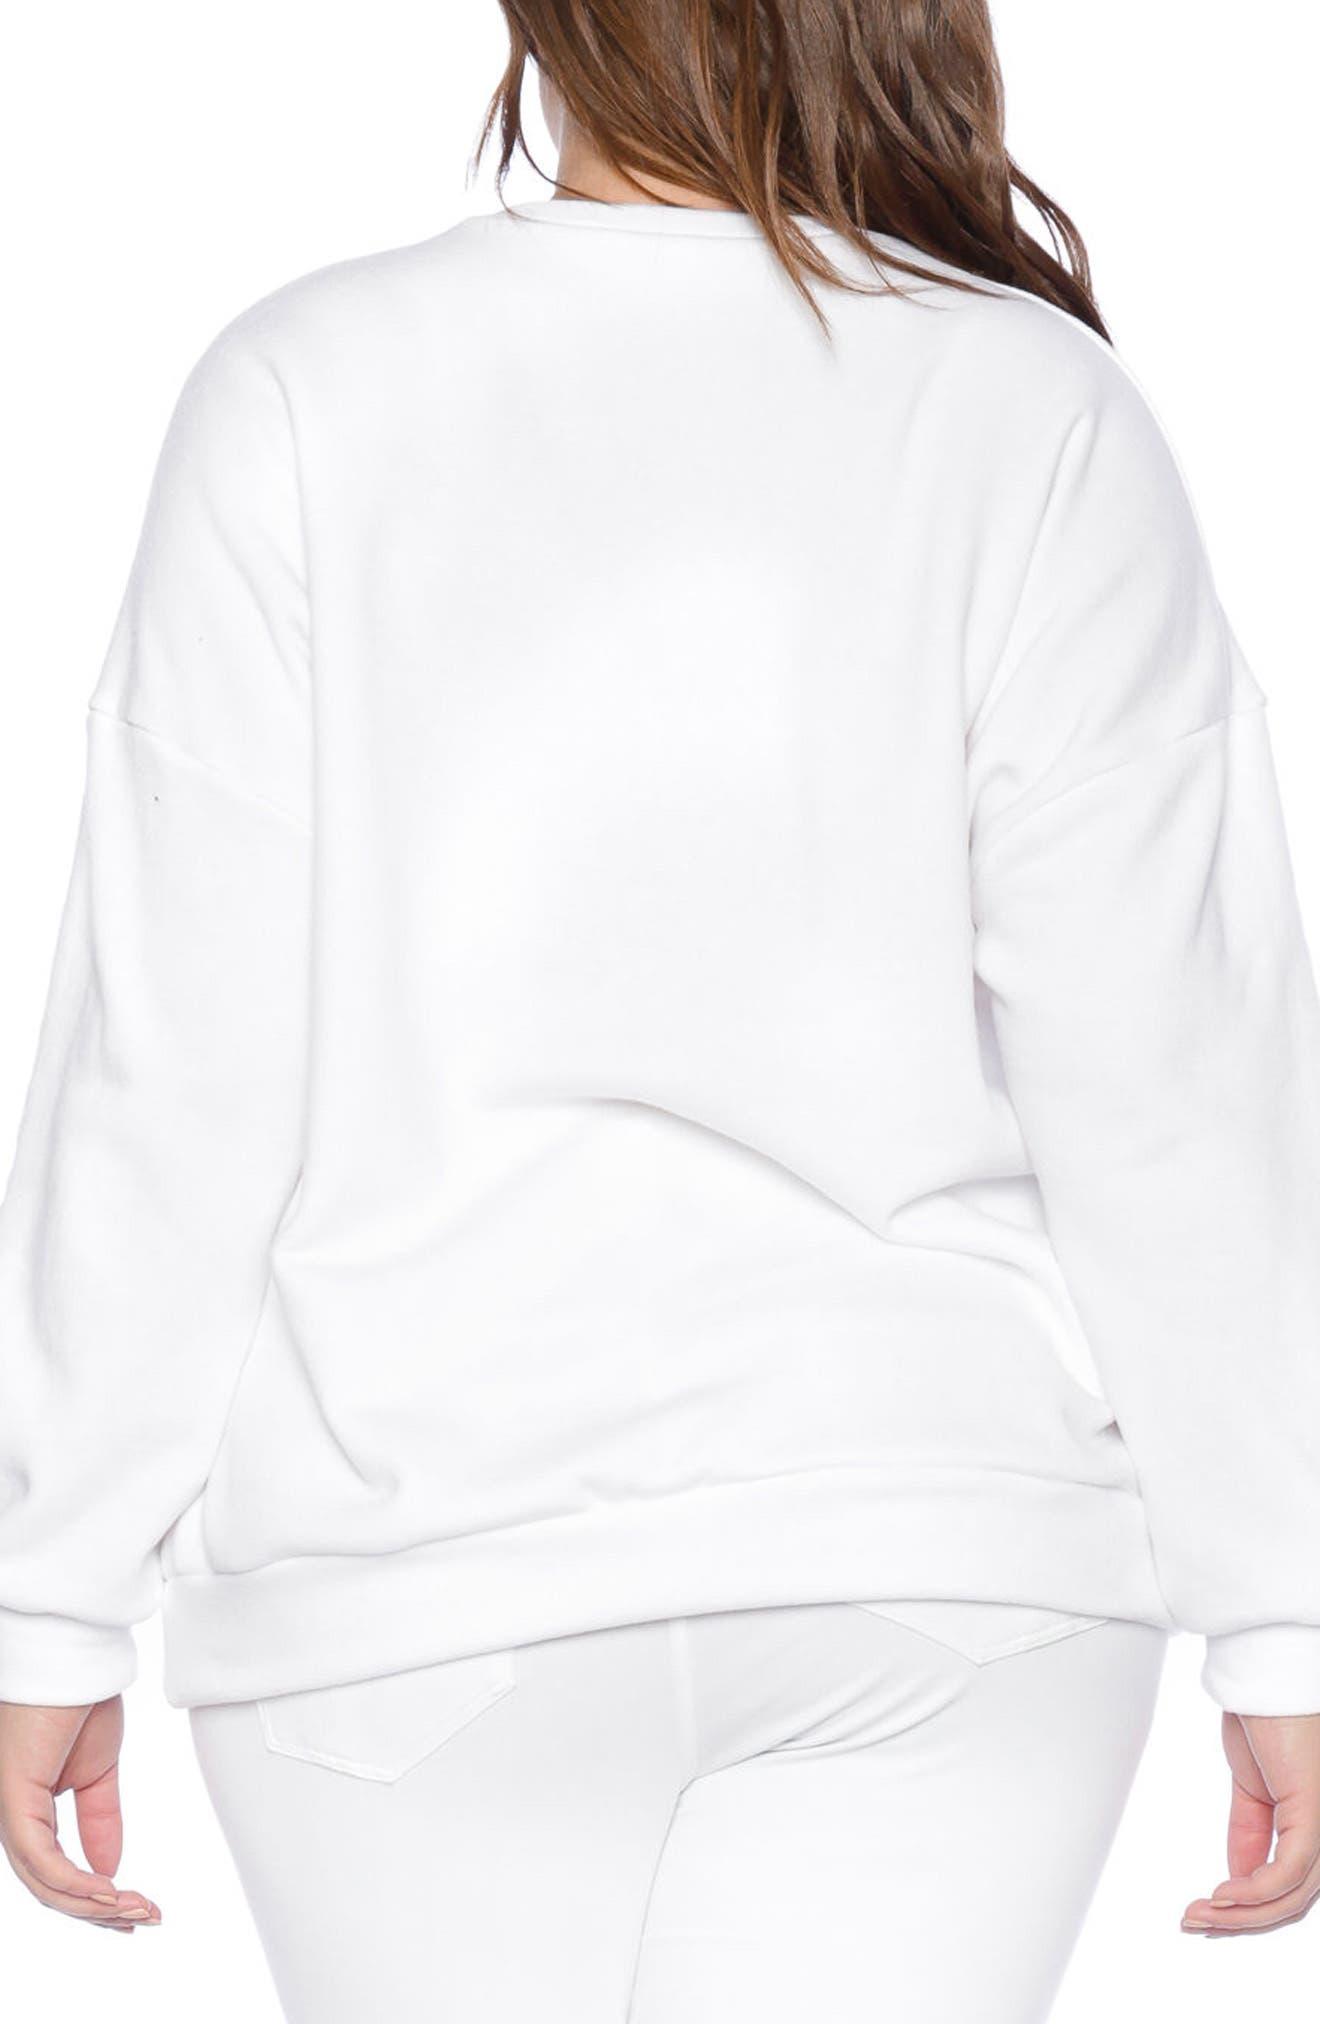 I Am the One Oversize Sweatshirt,                             Alternate thumbnail 2, color,                             White